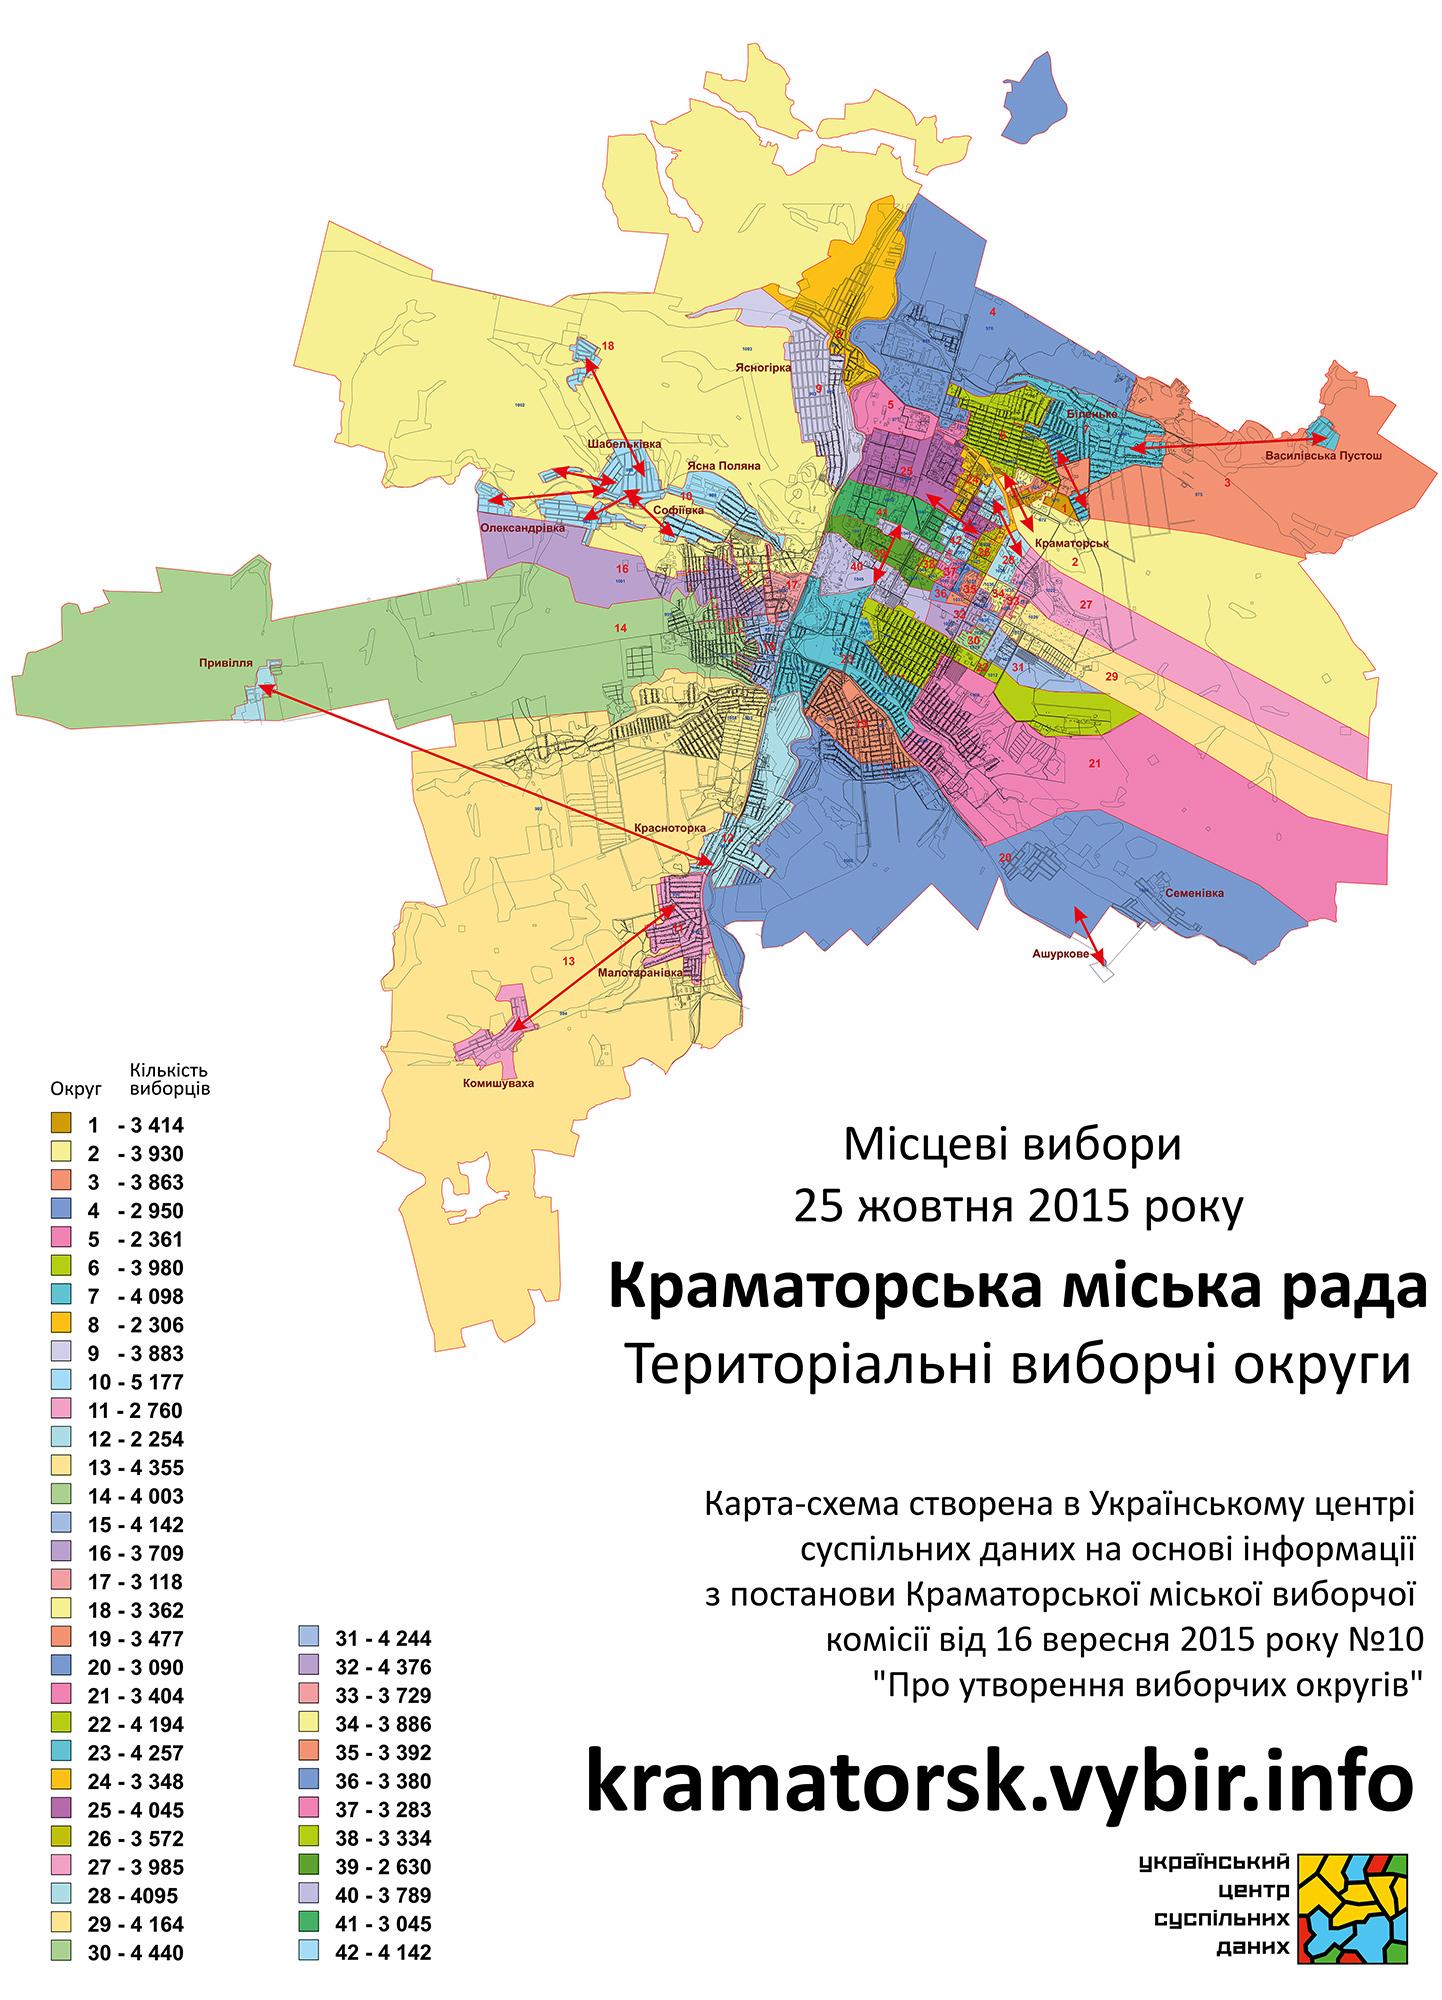 Kramatorsk_map_full_fb